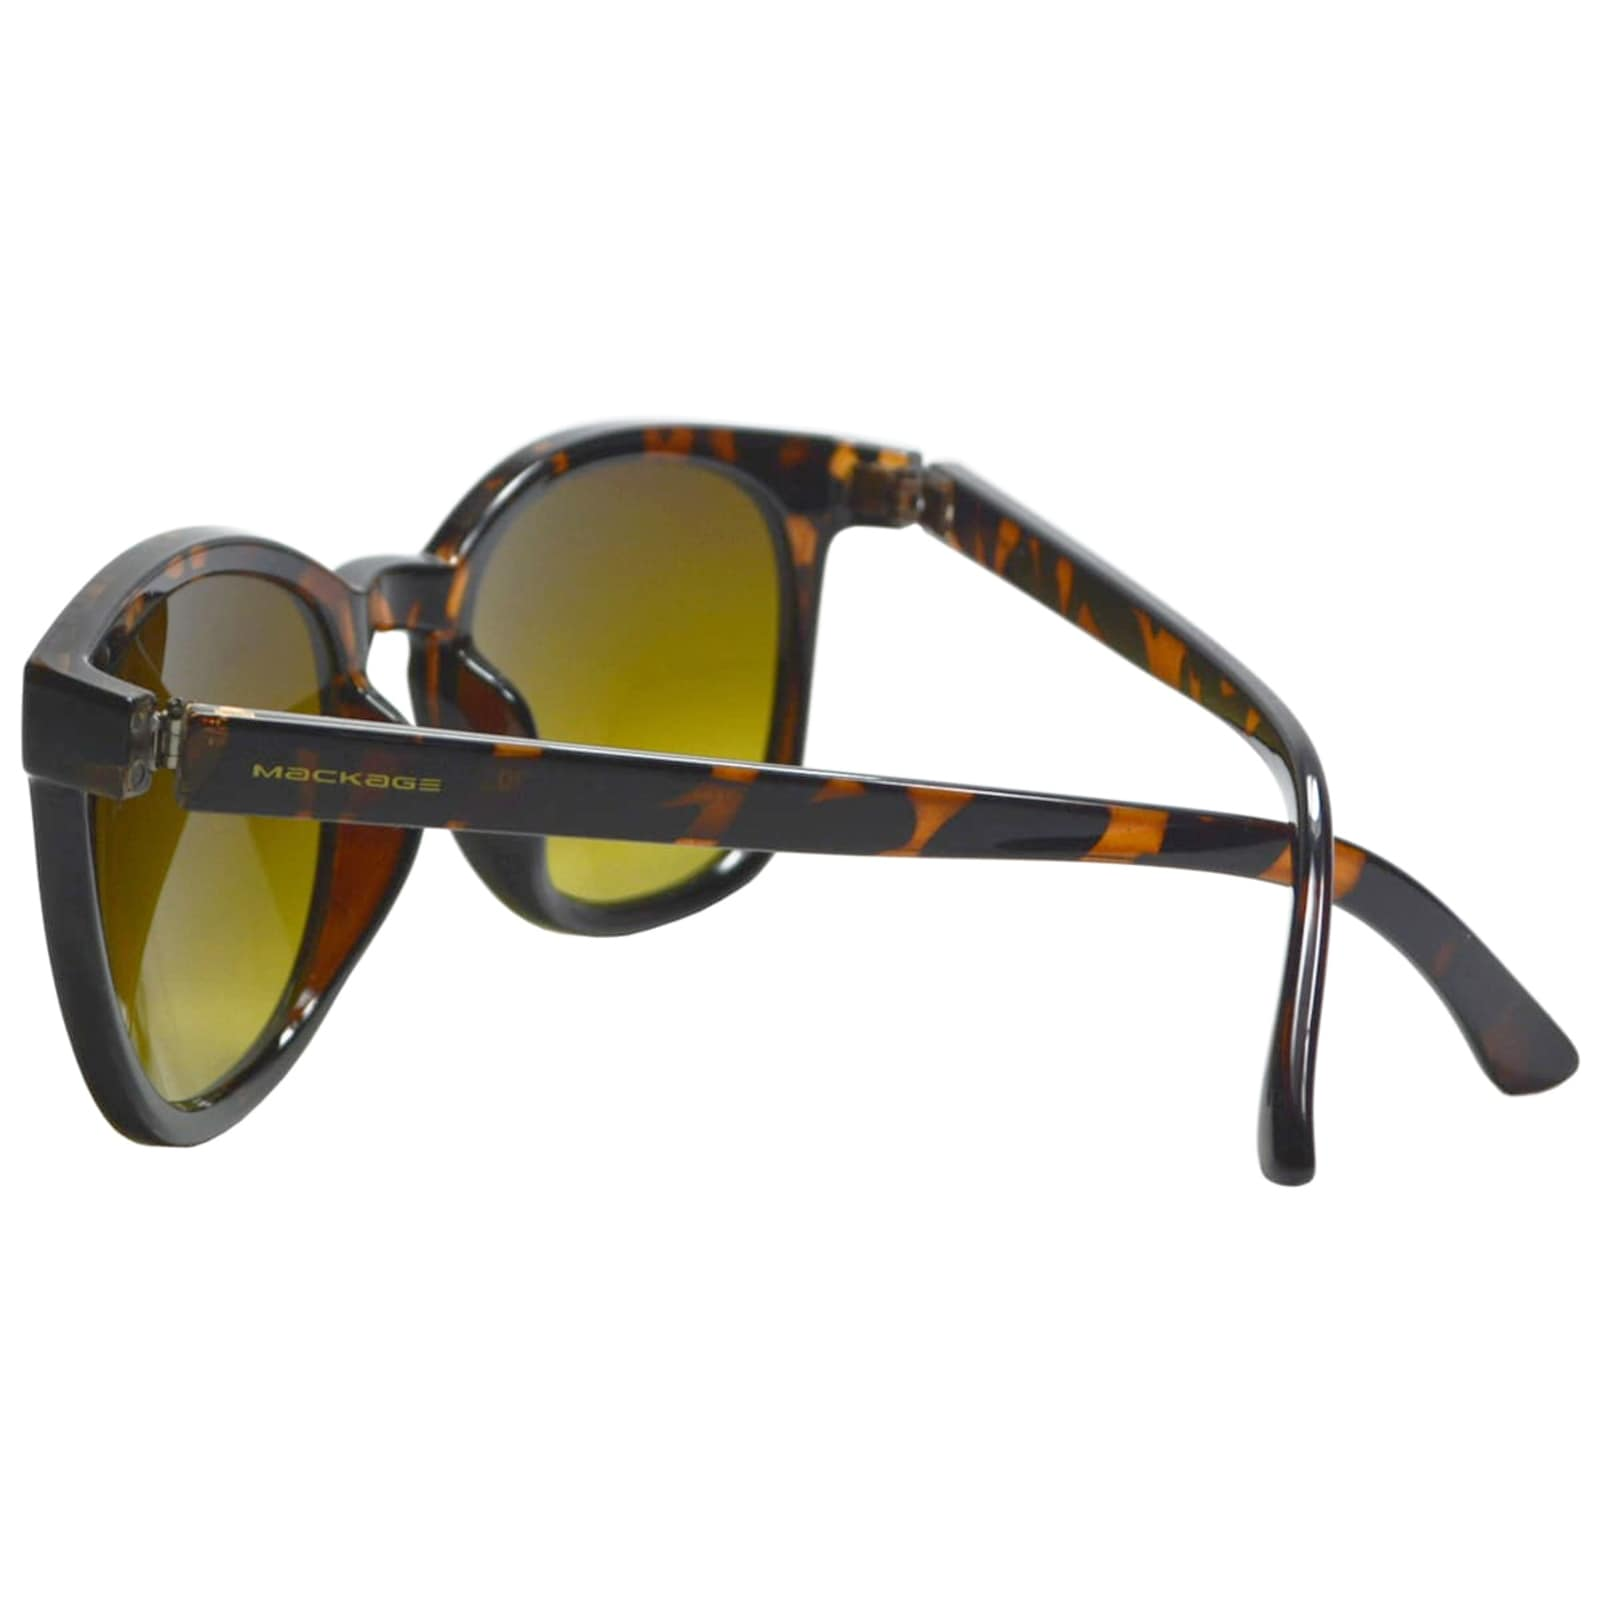 Óculos de Sol Mackage AMK18002 Marrom Tarta